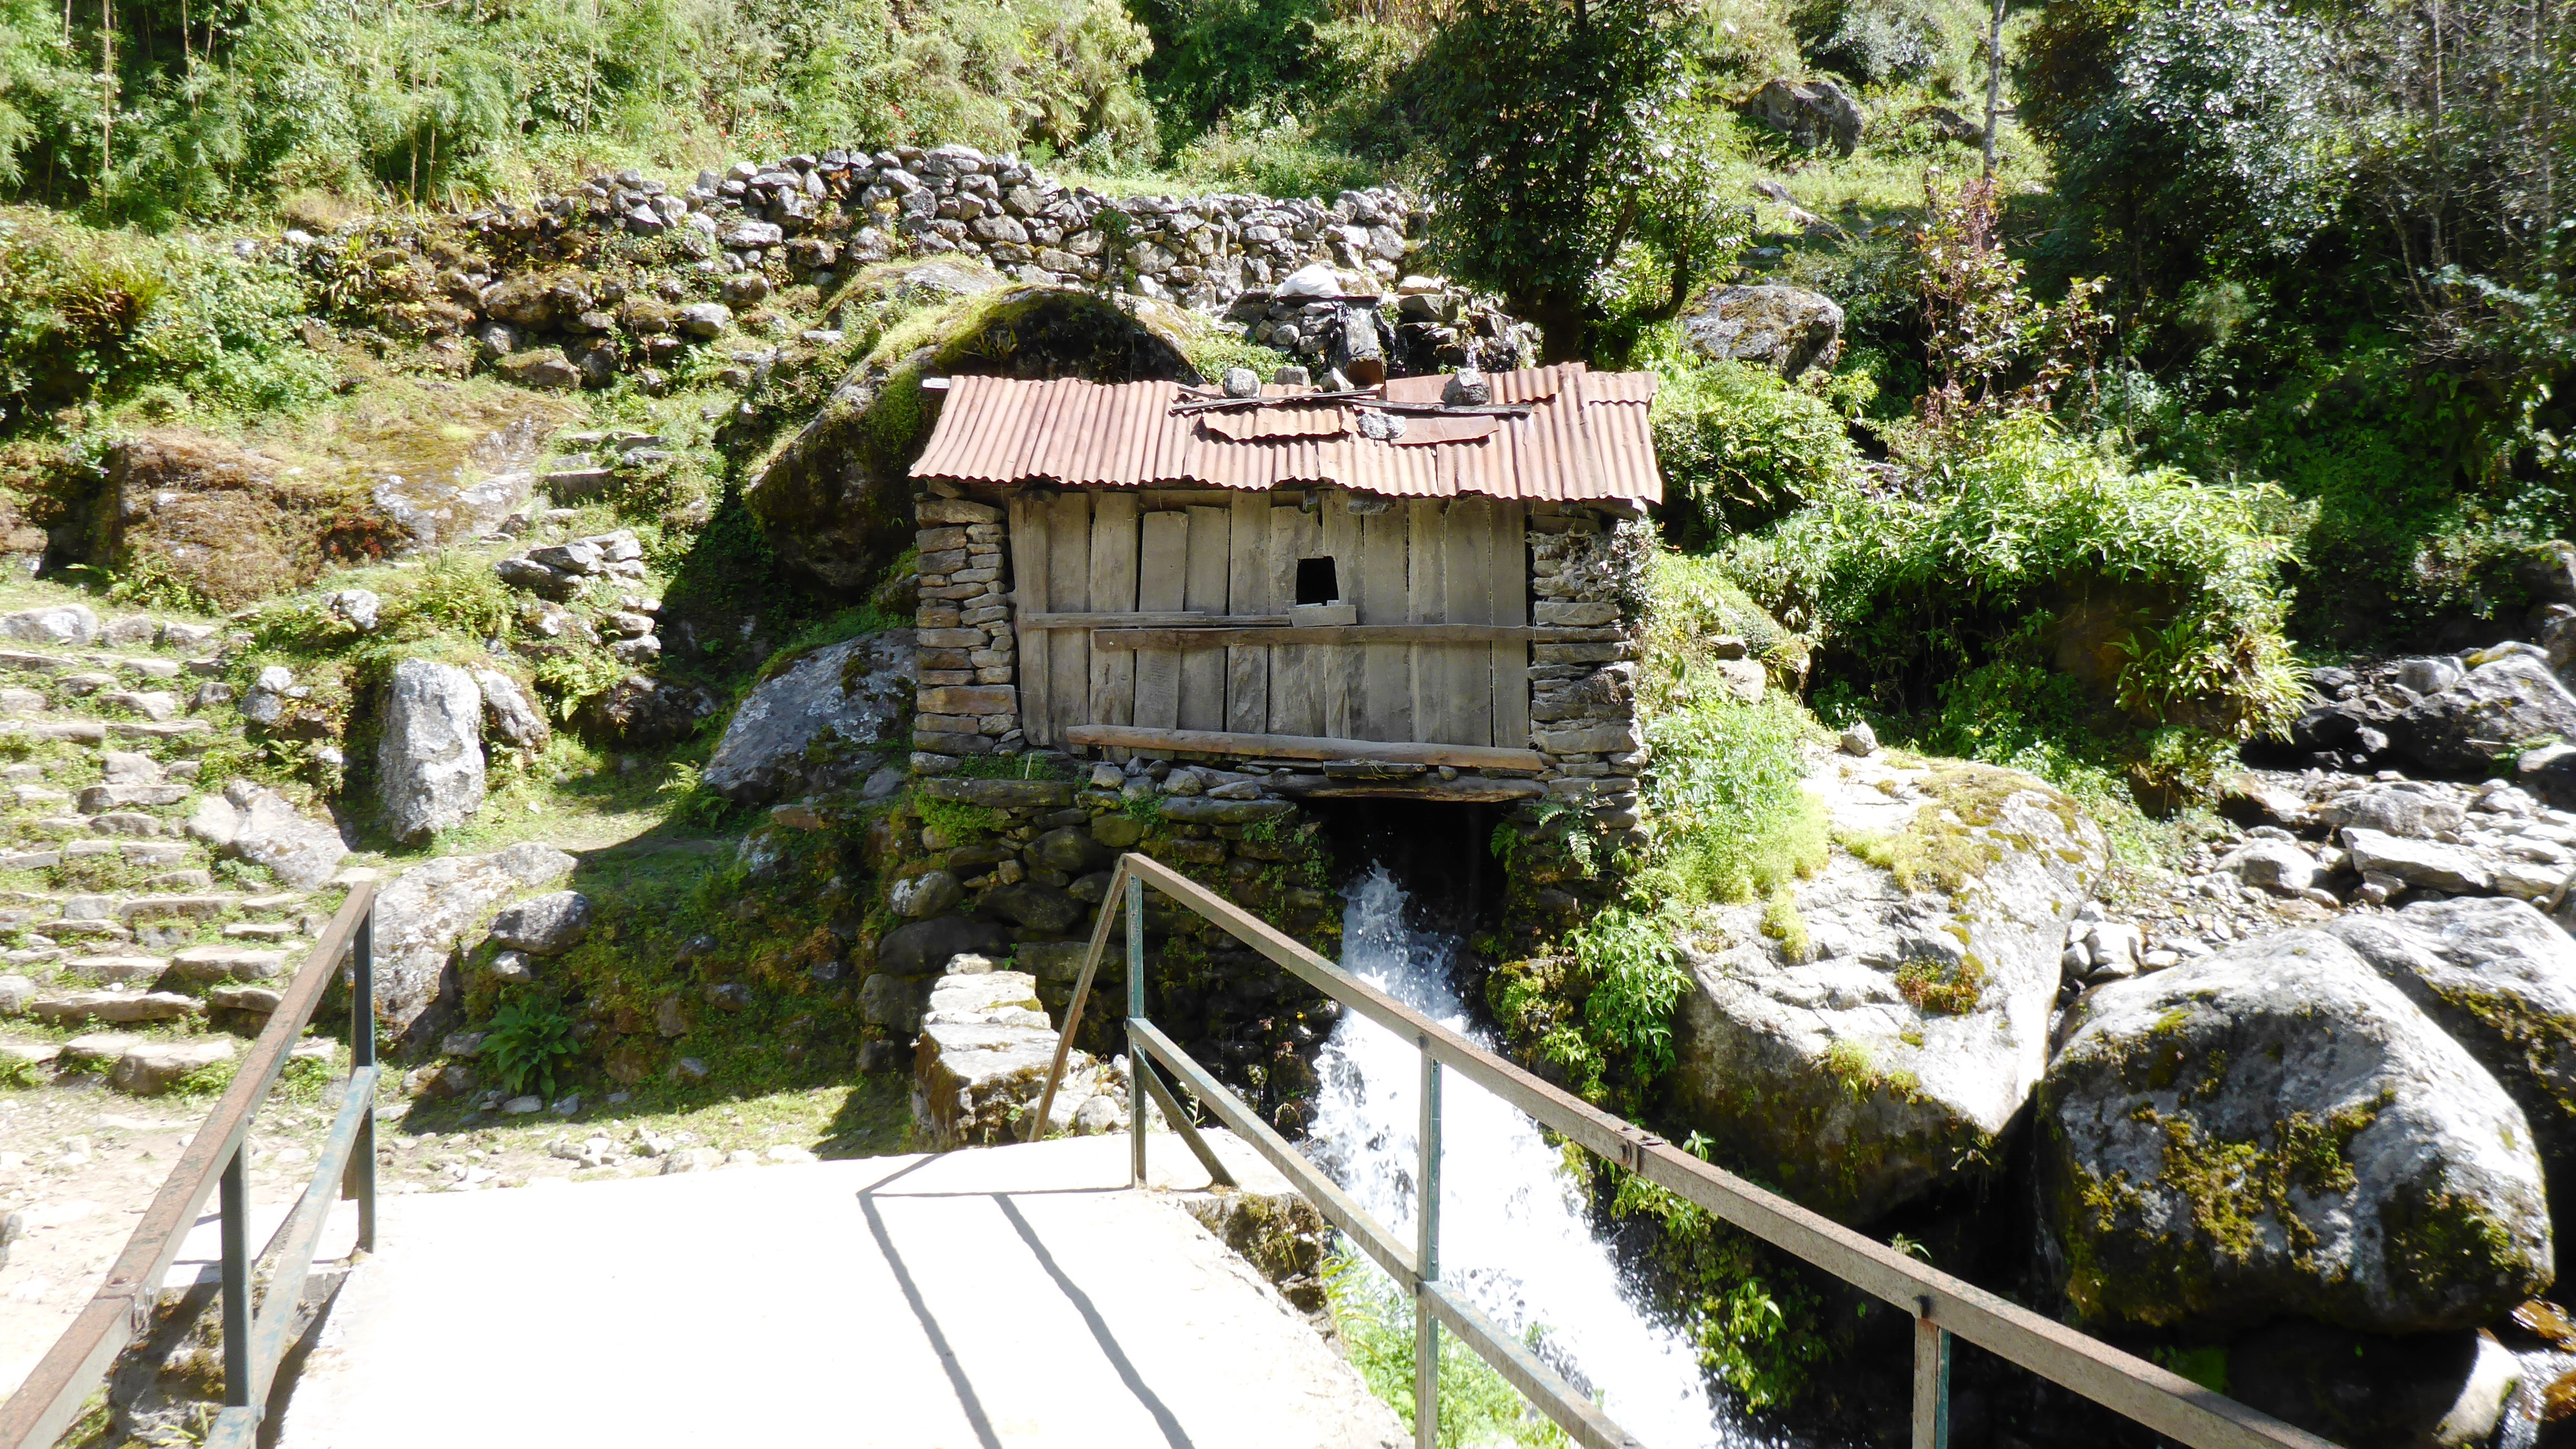 Bridge & Hut